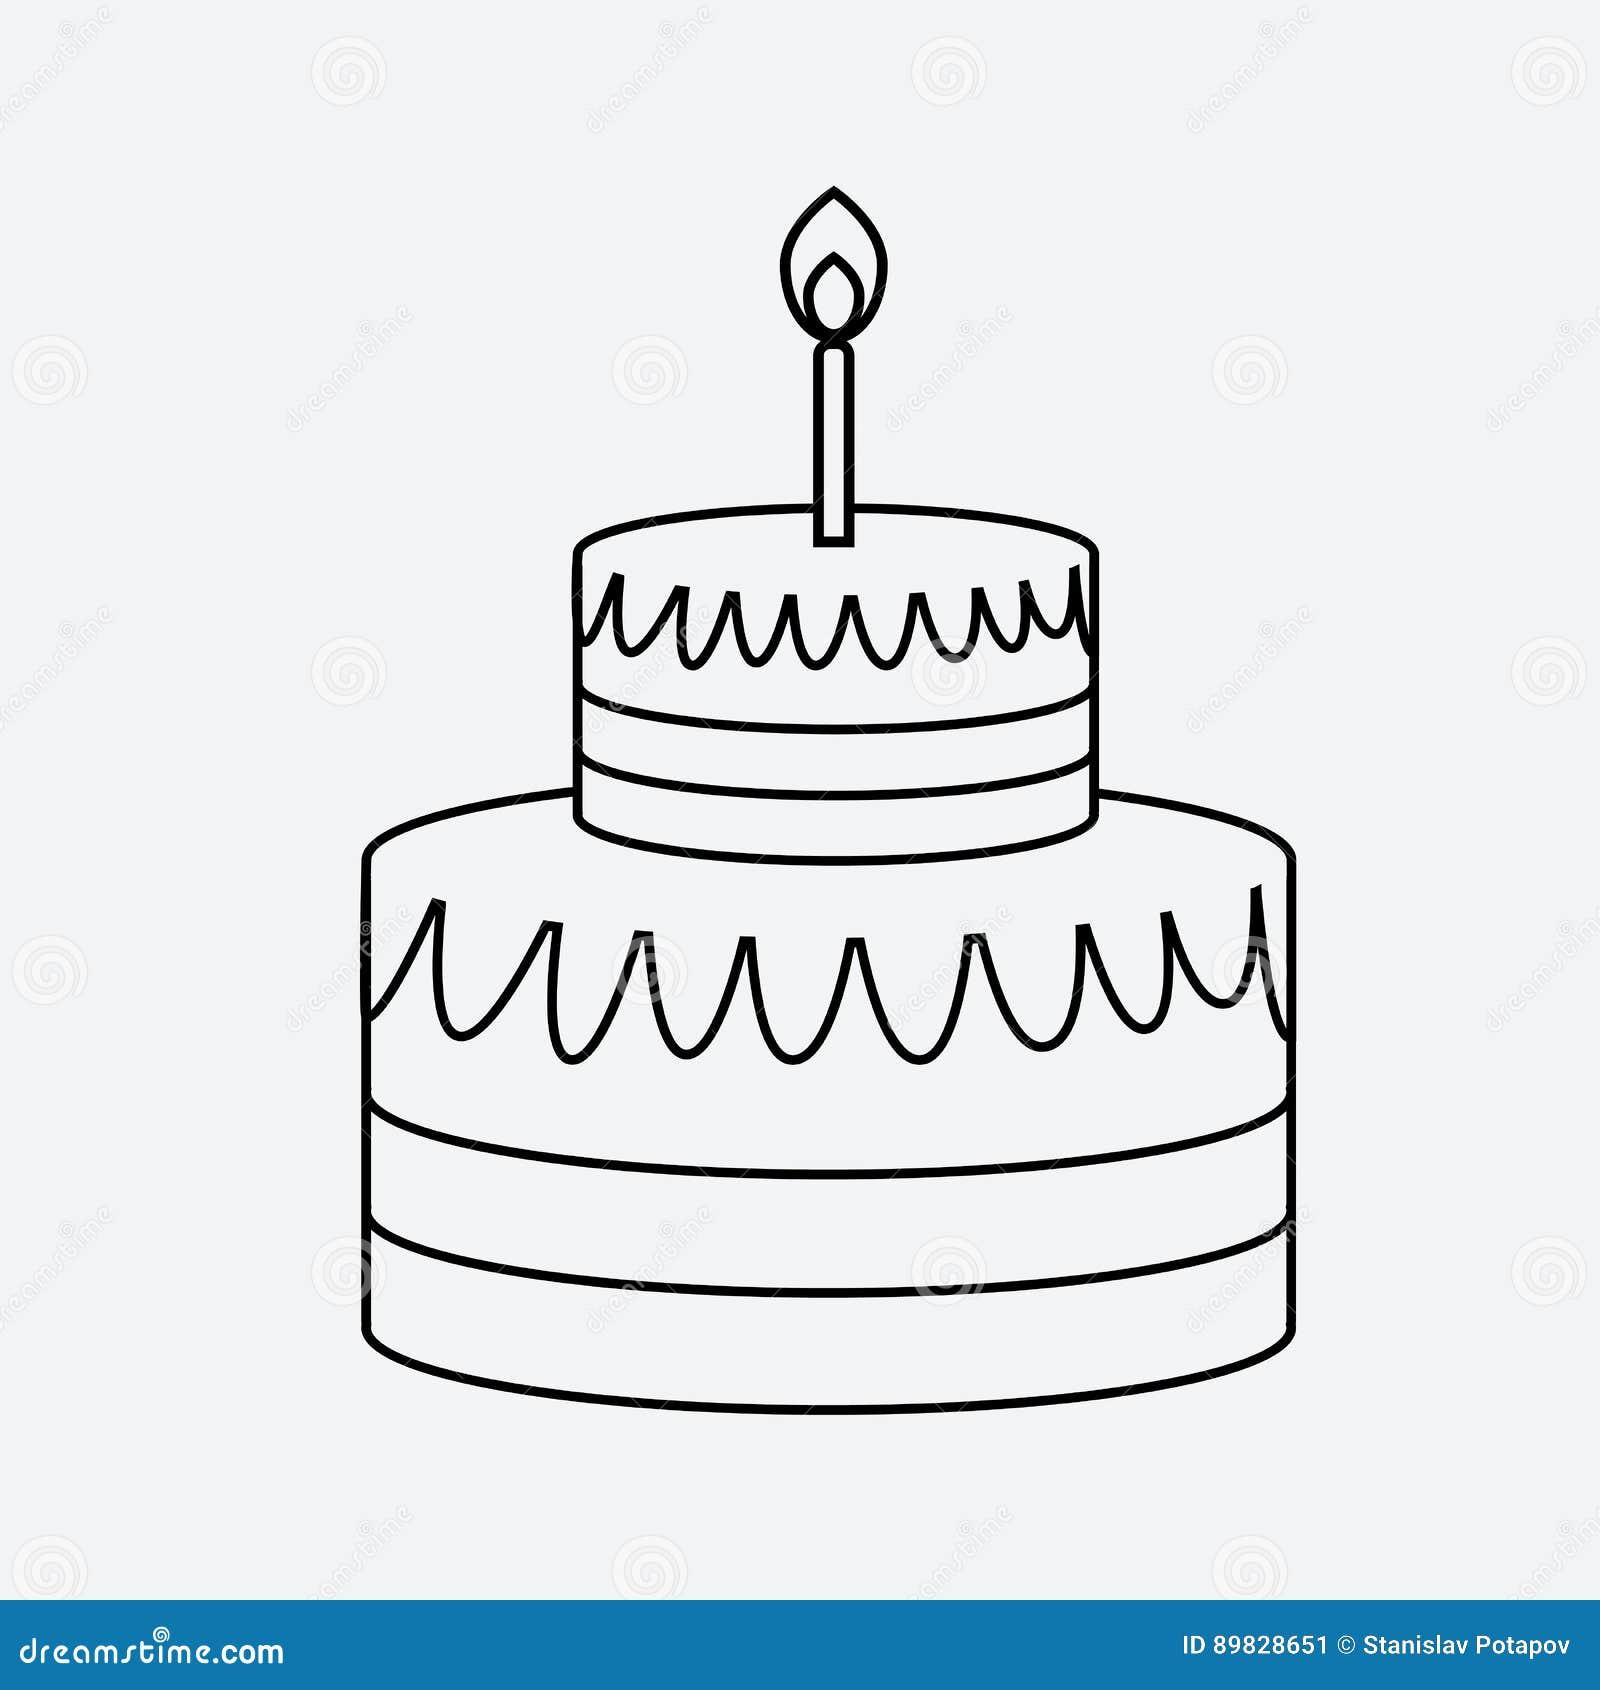 Estilo plano mínimo del icono linear de la torta